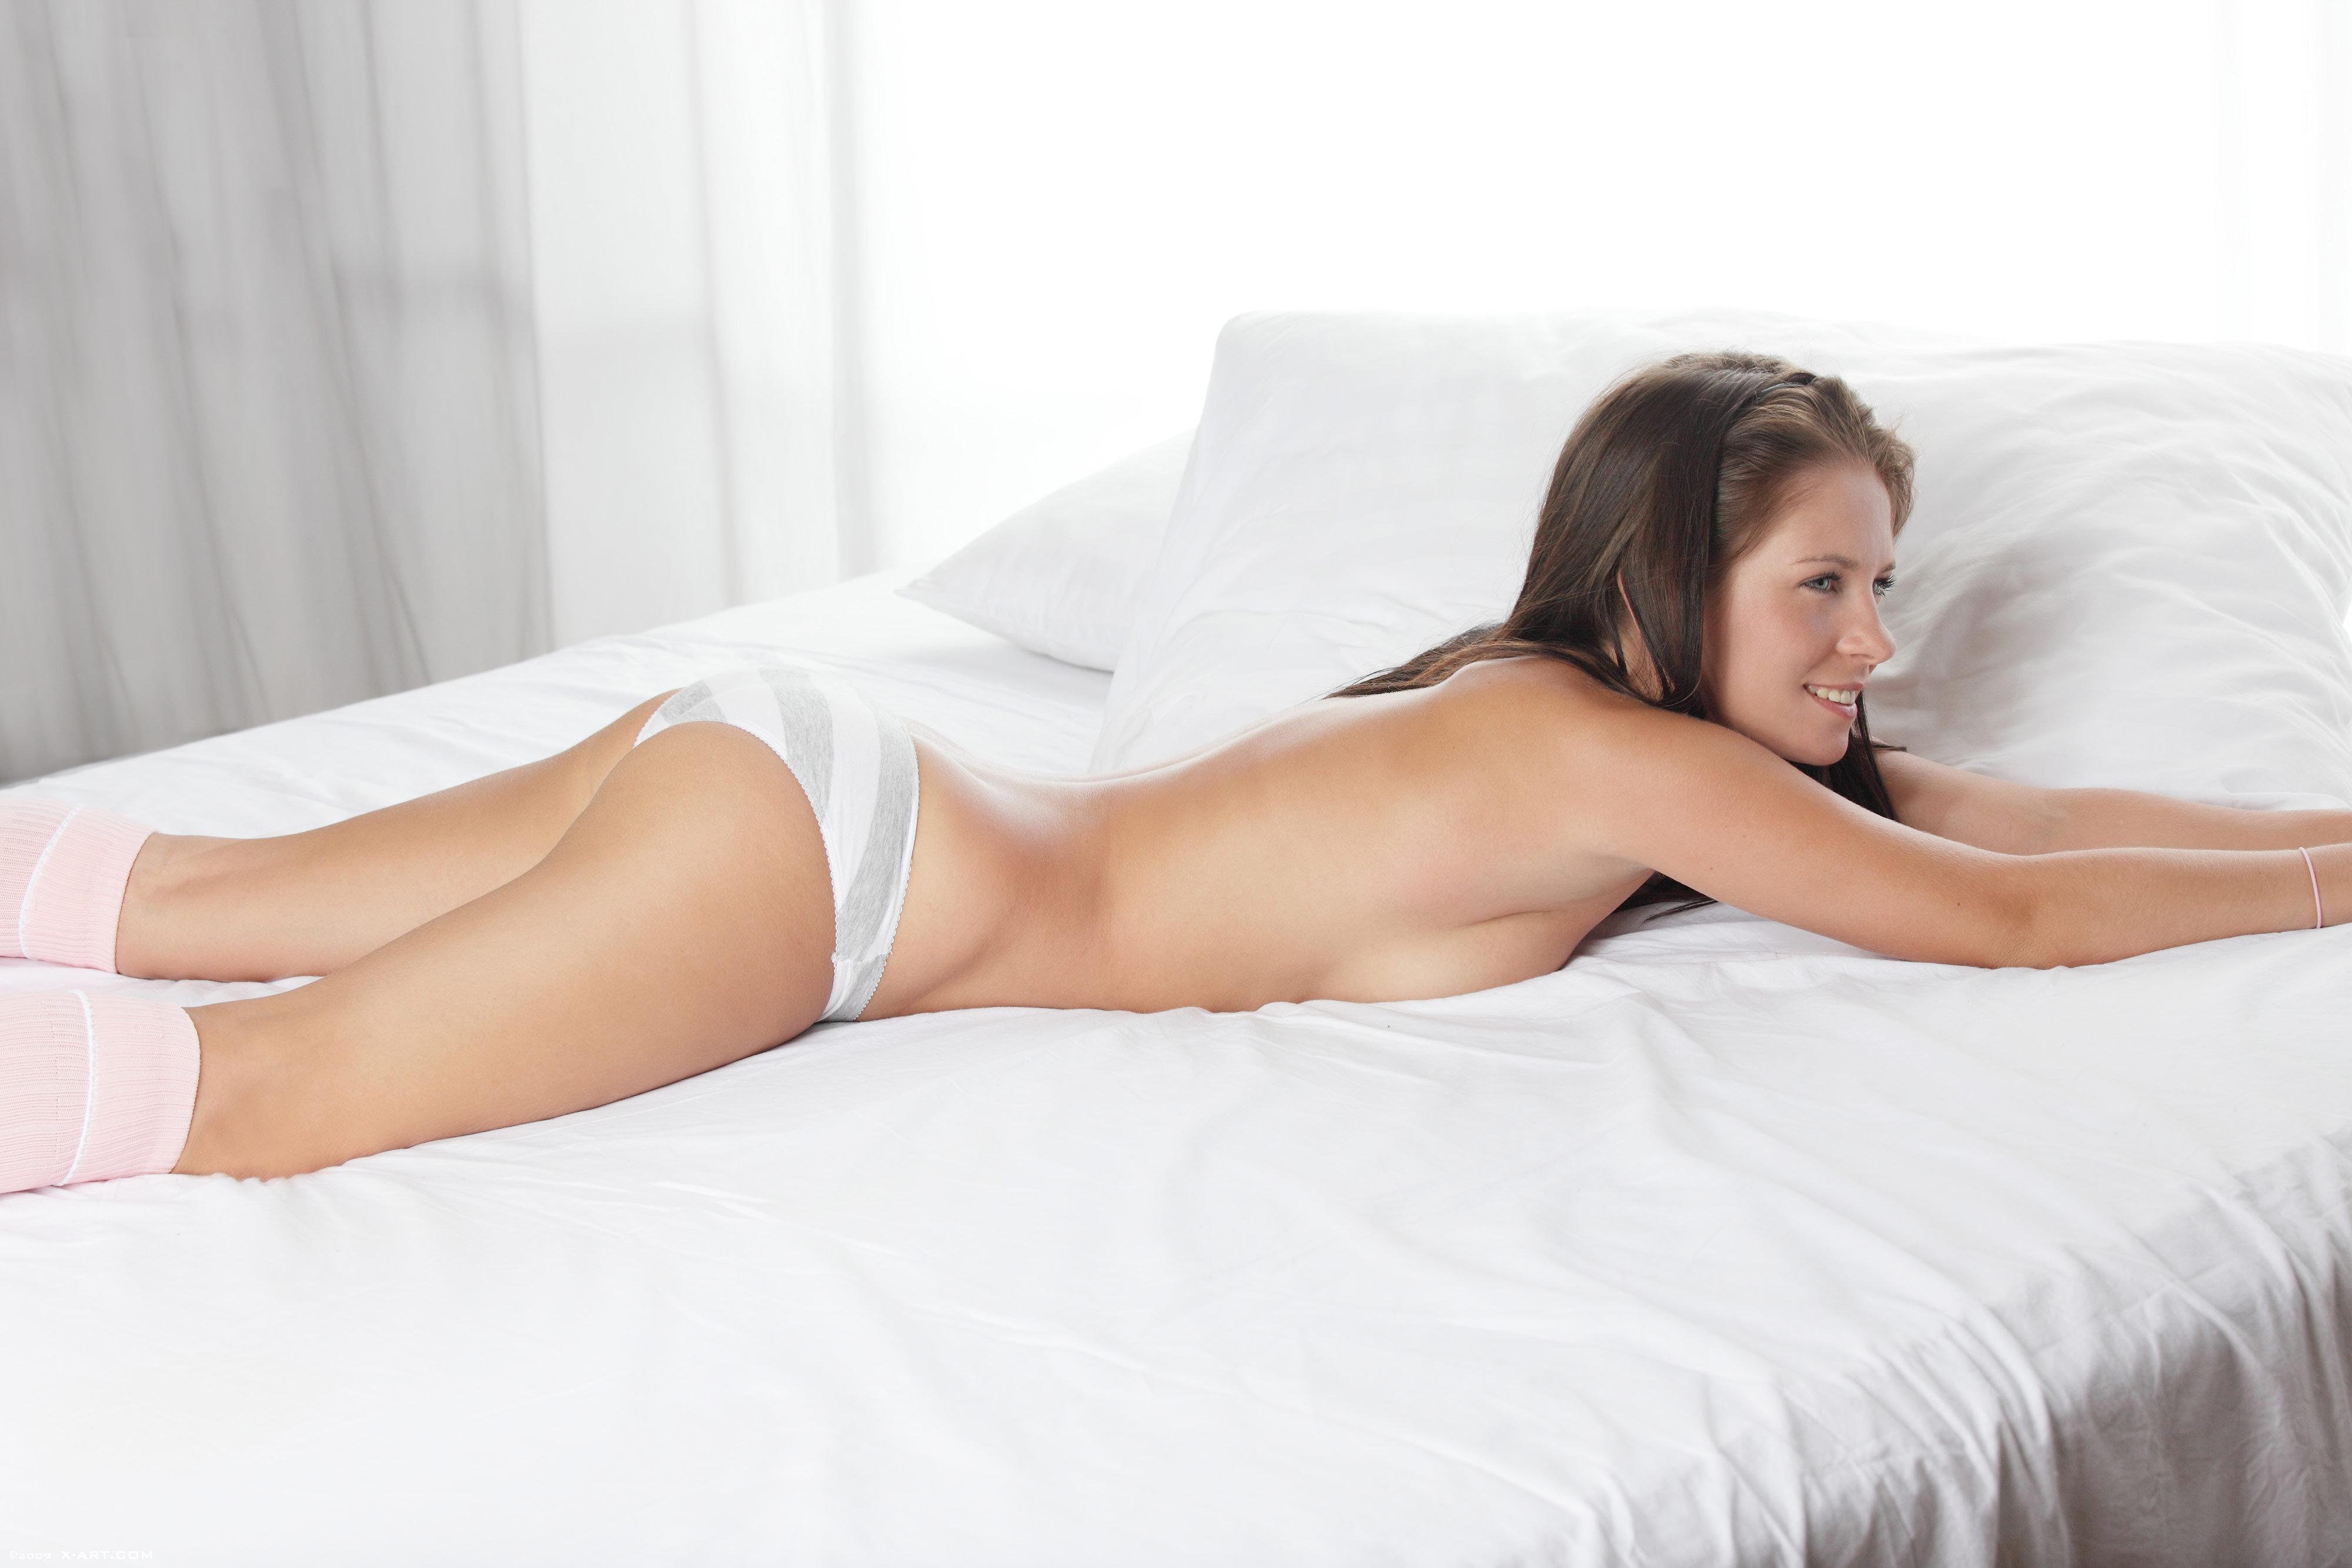 Стрептиз на кровати 23 фотография